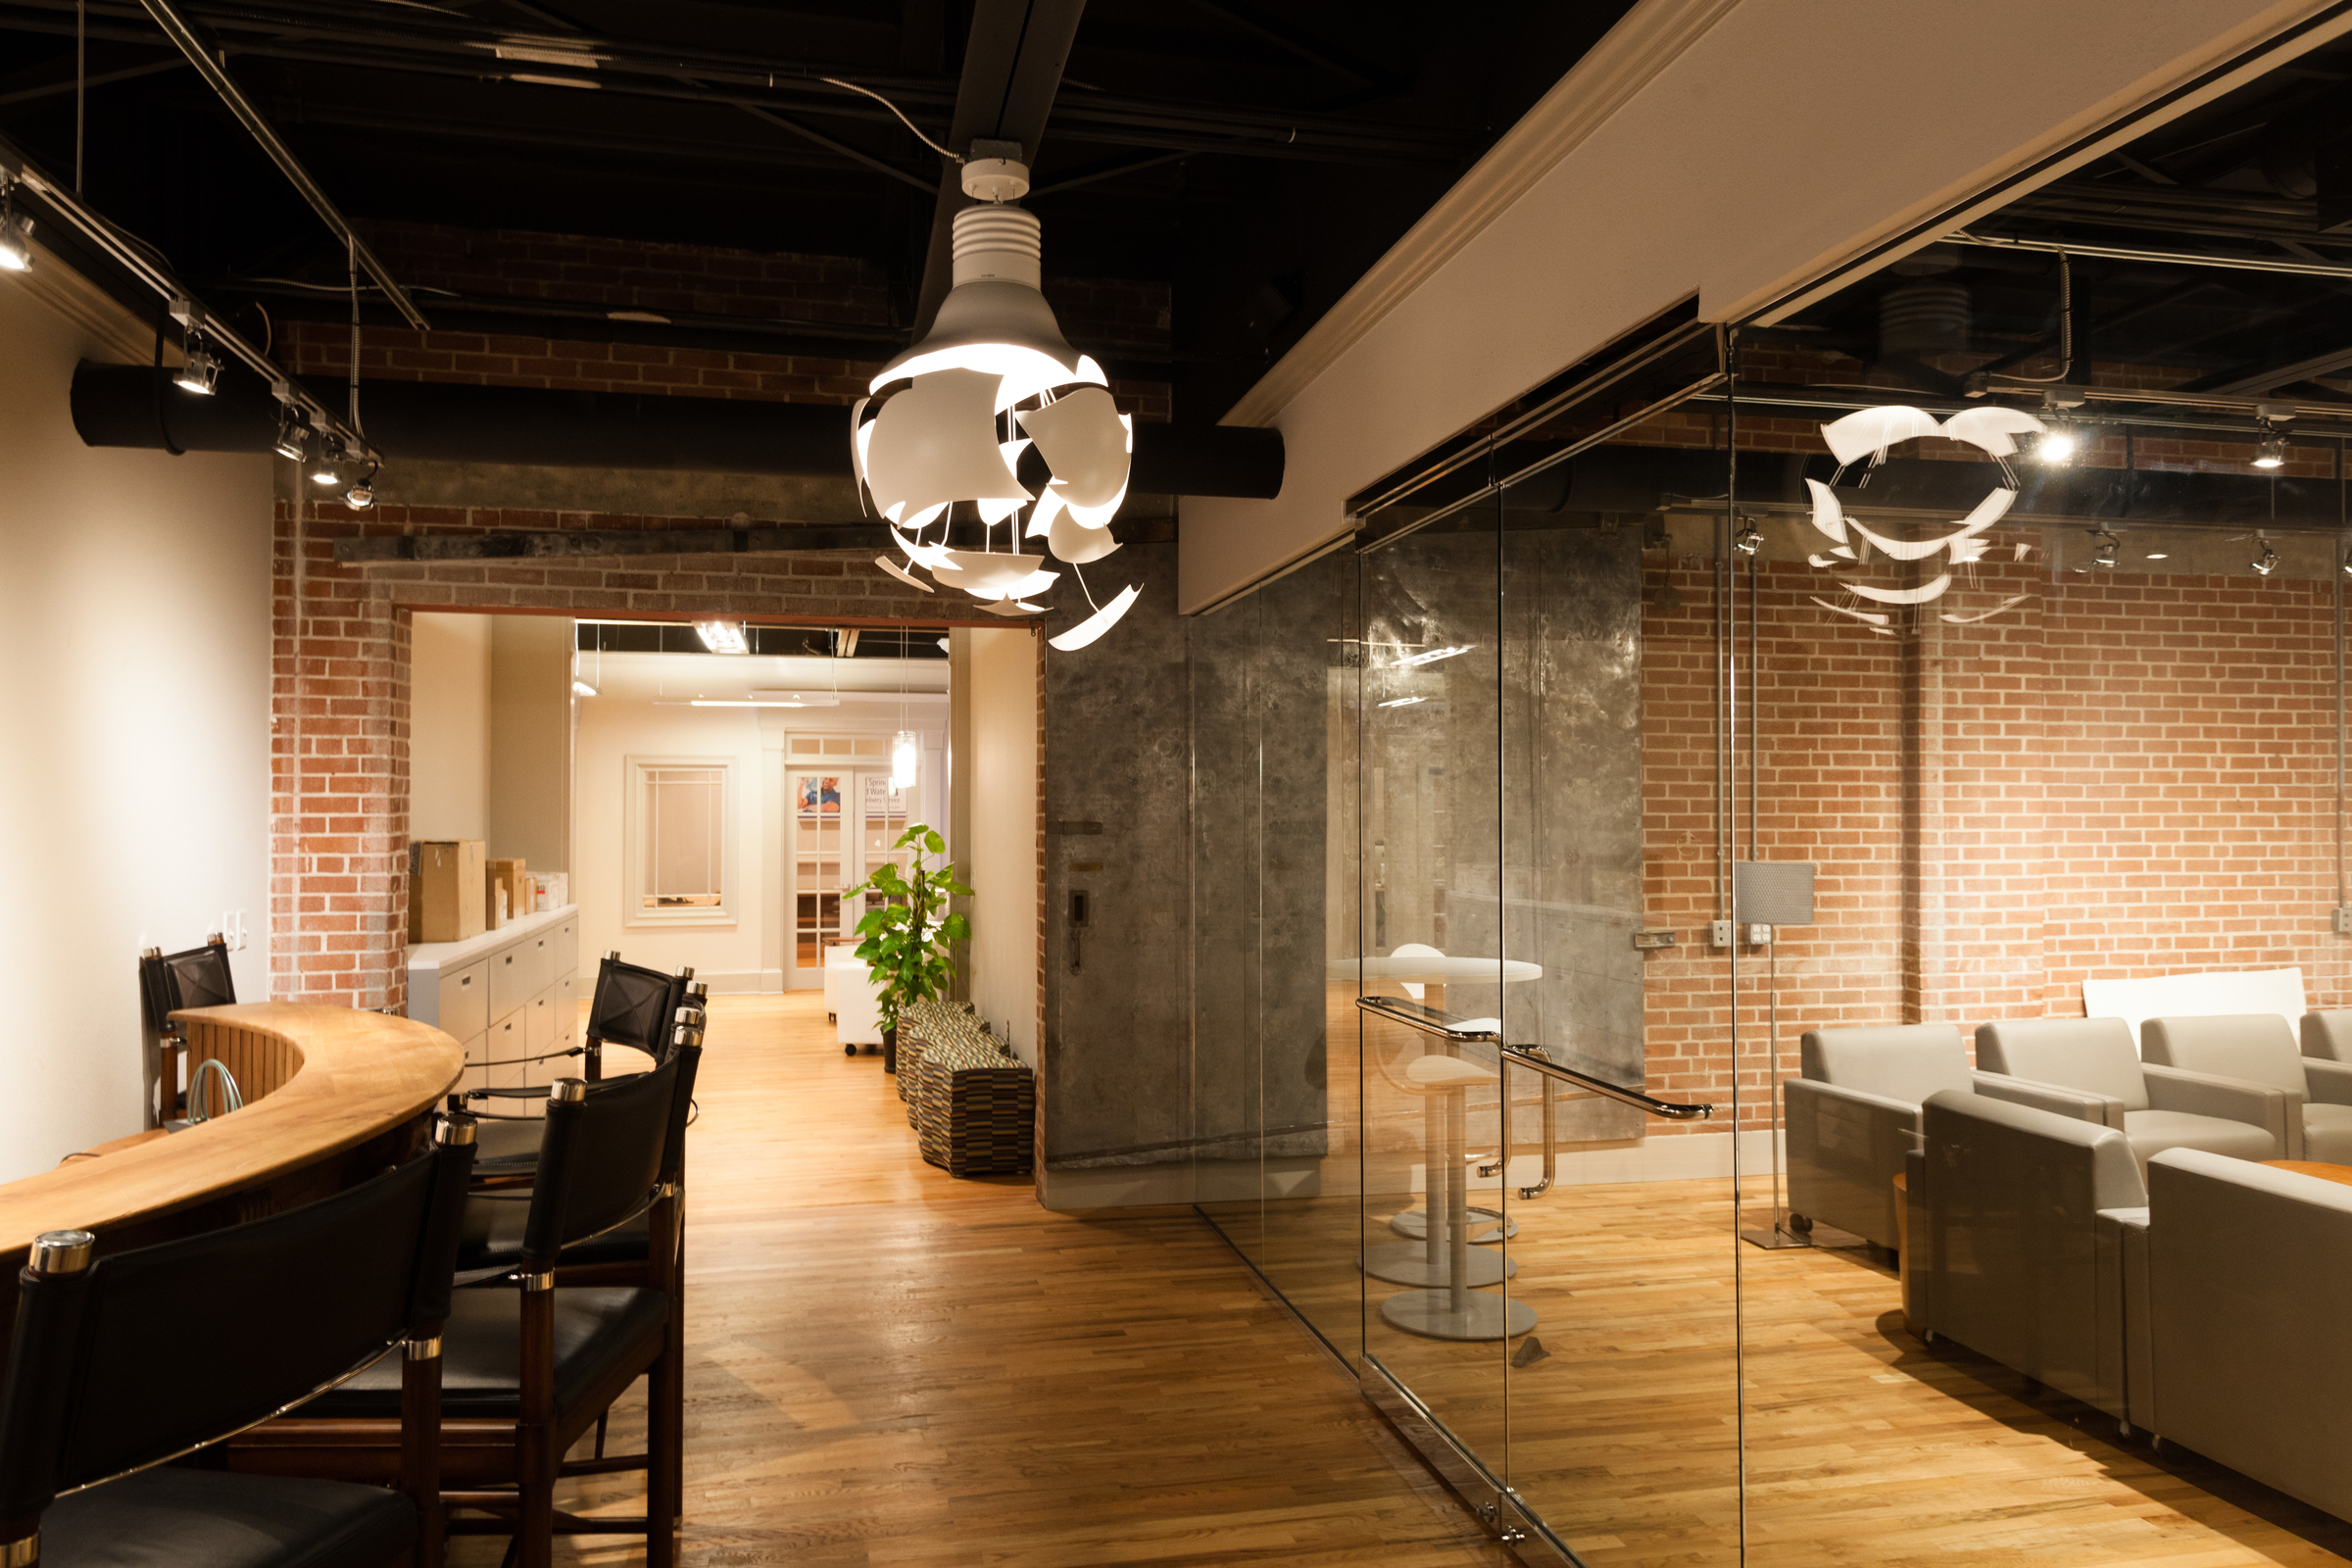 FireWorks Hallway.JPG